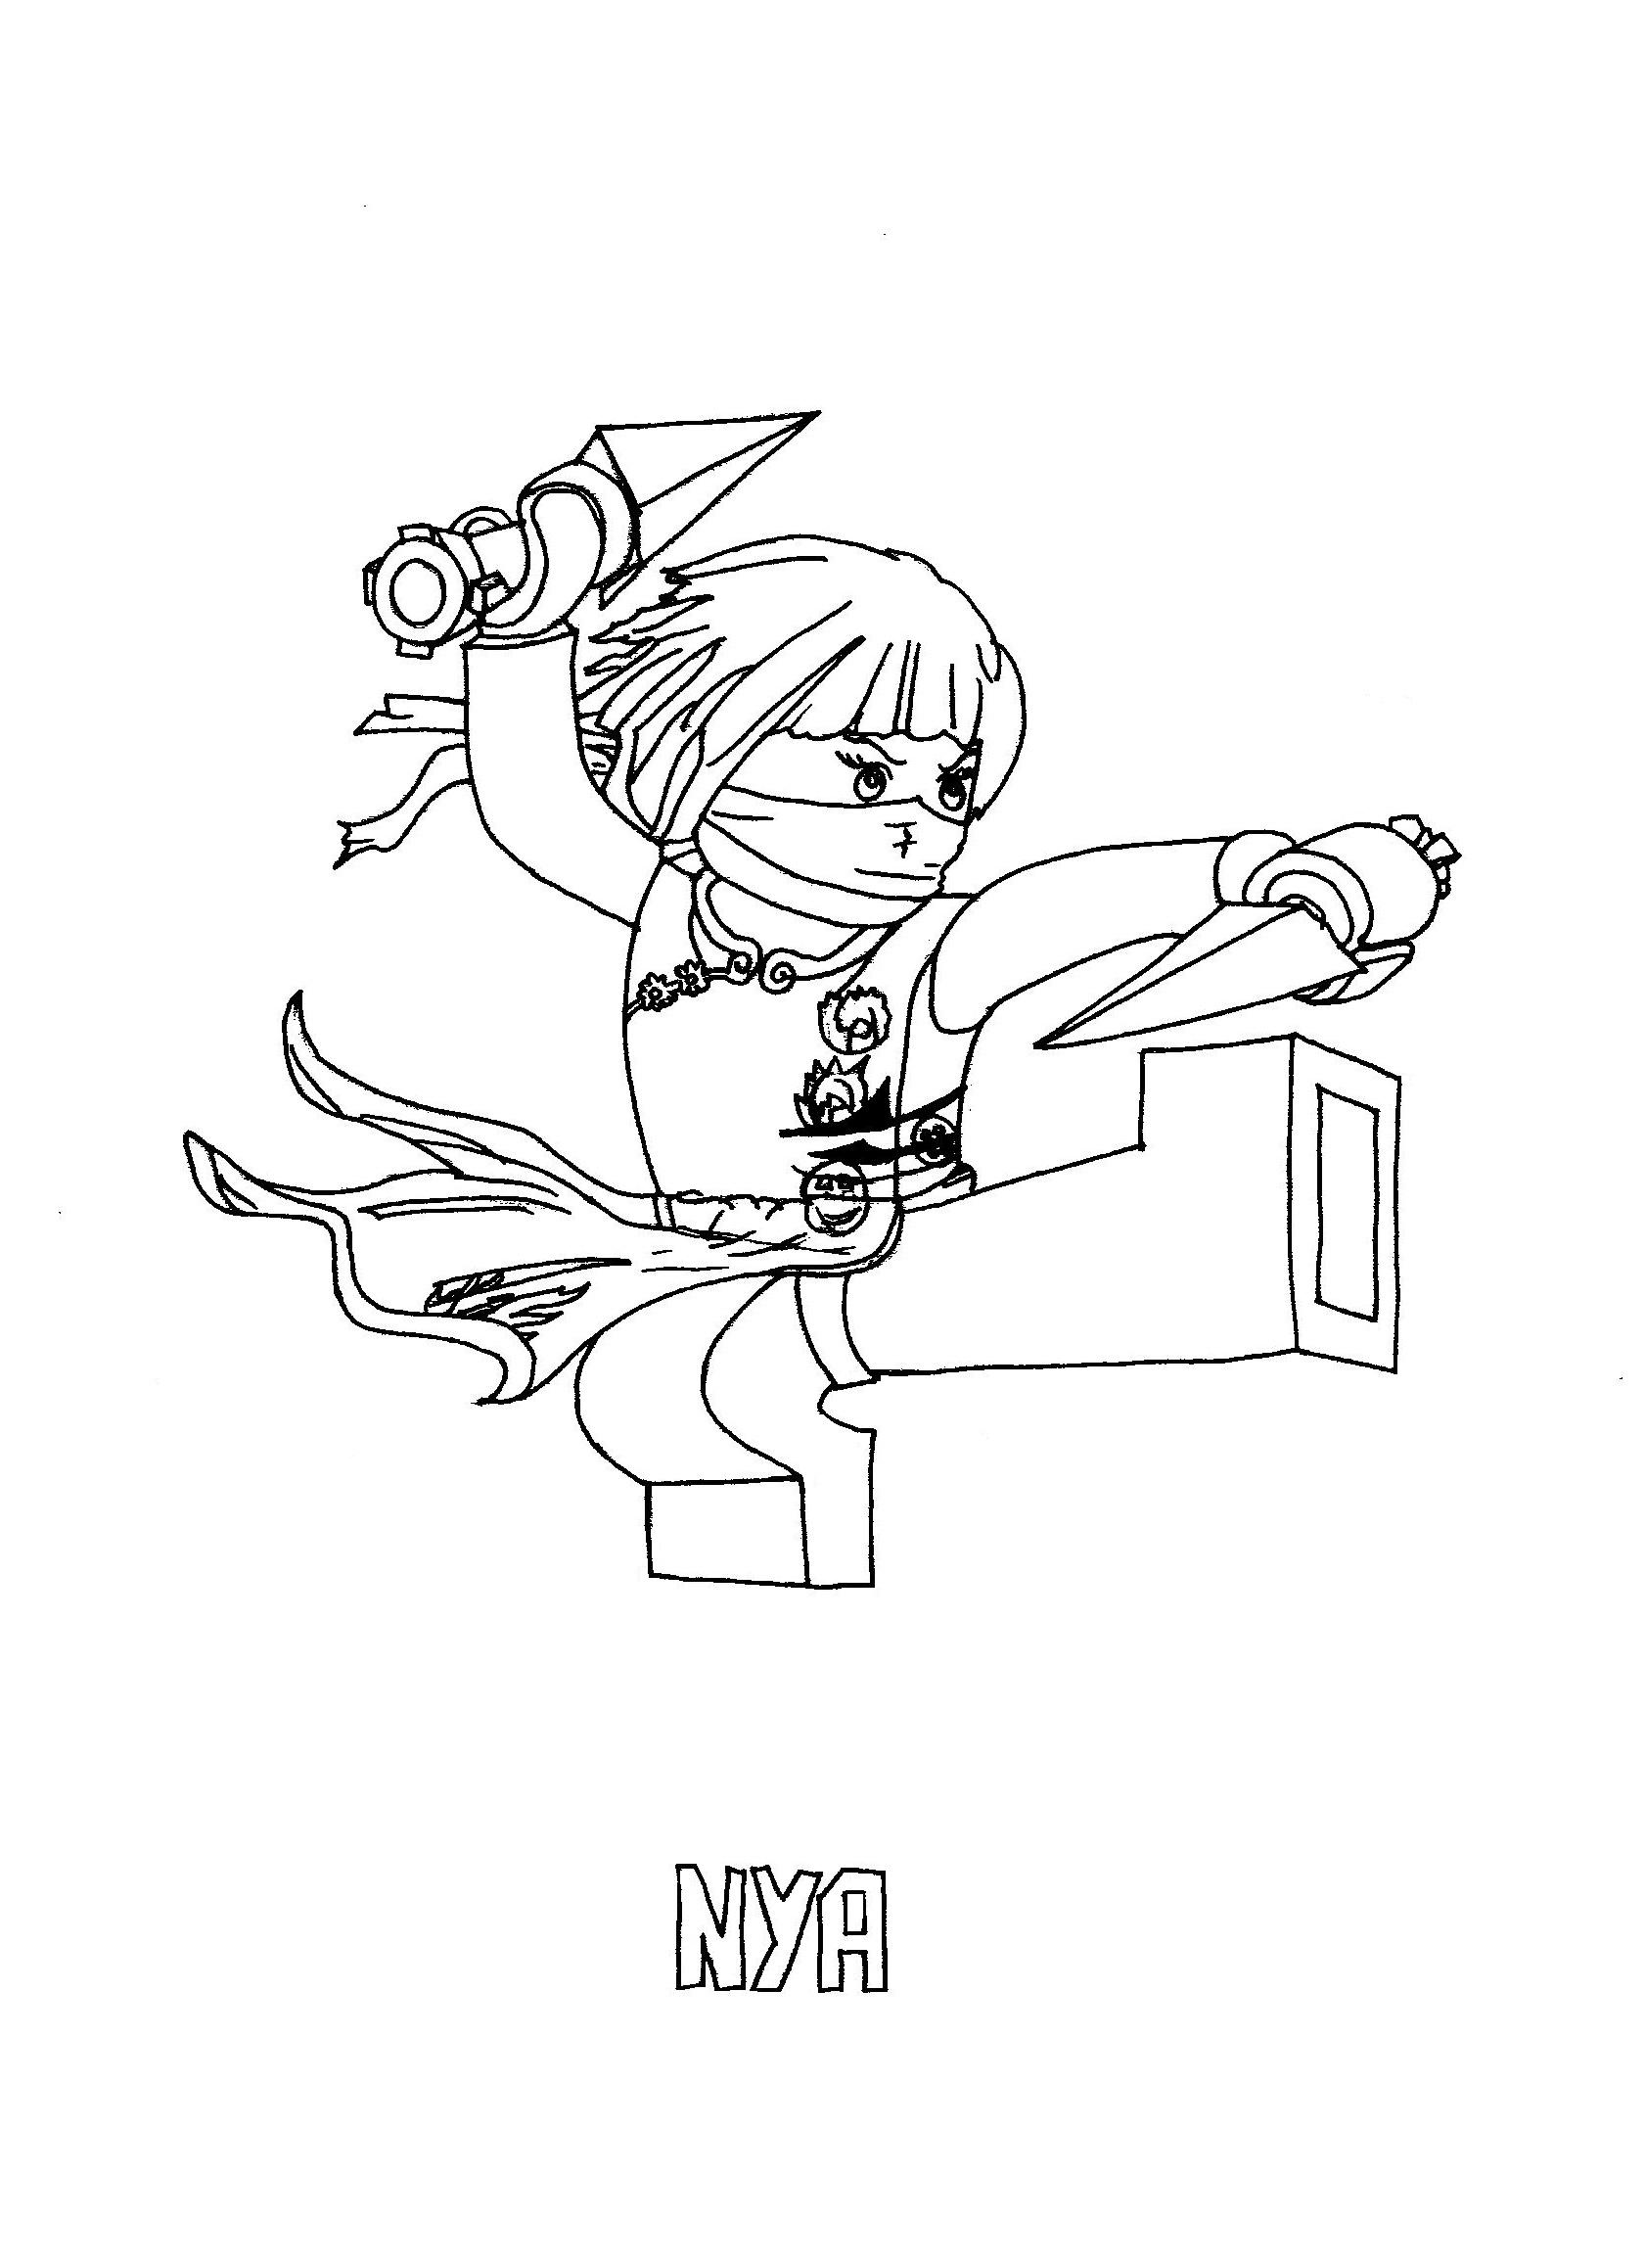 Coloriage ninjago gratuit - dessin a imprimer #76